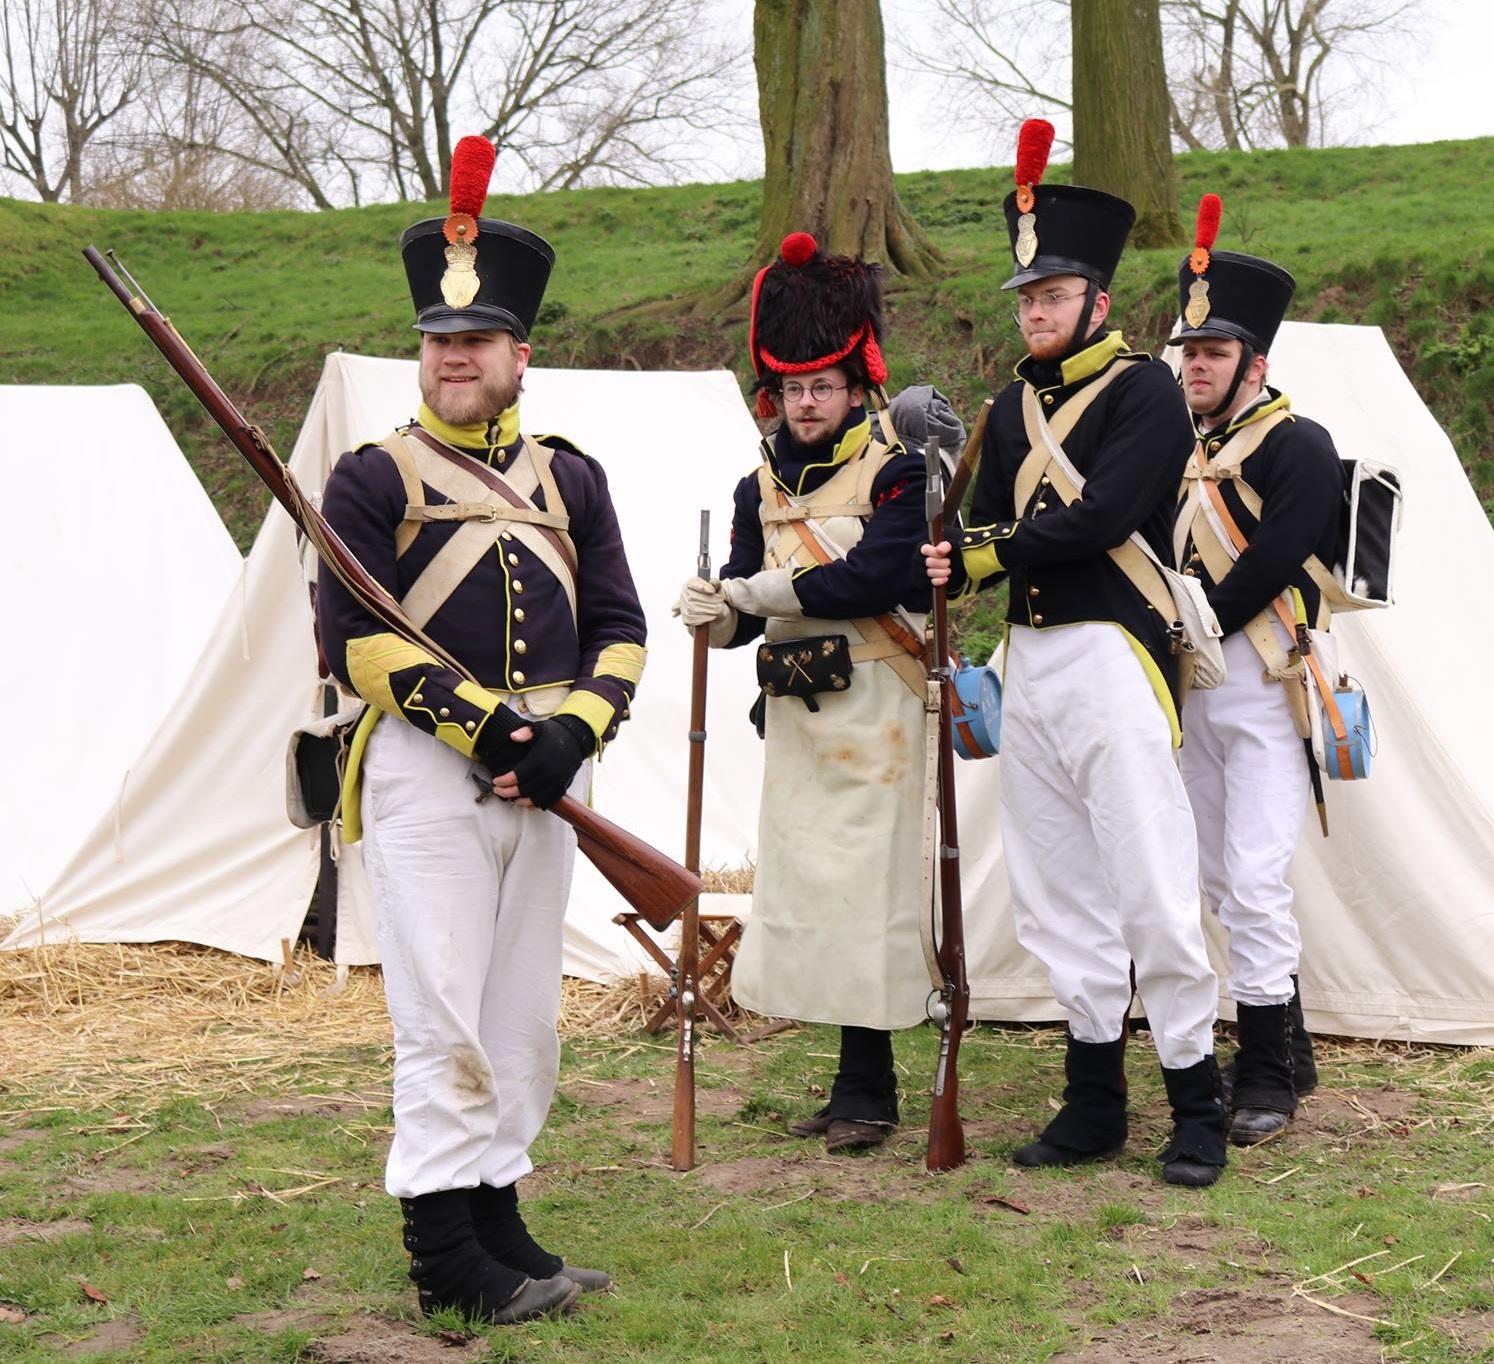 2e Bataljon Grenadier Compagnie